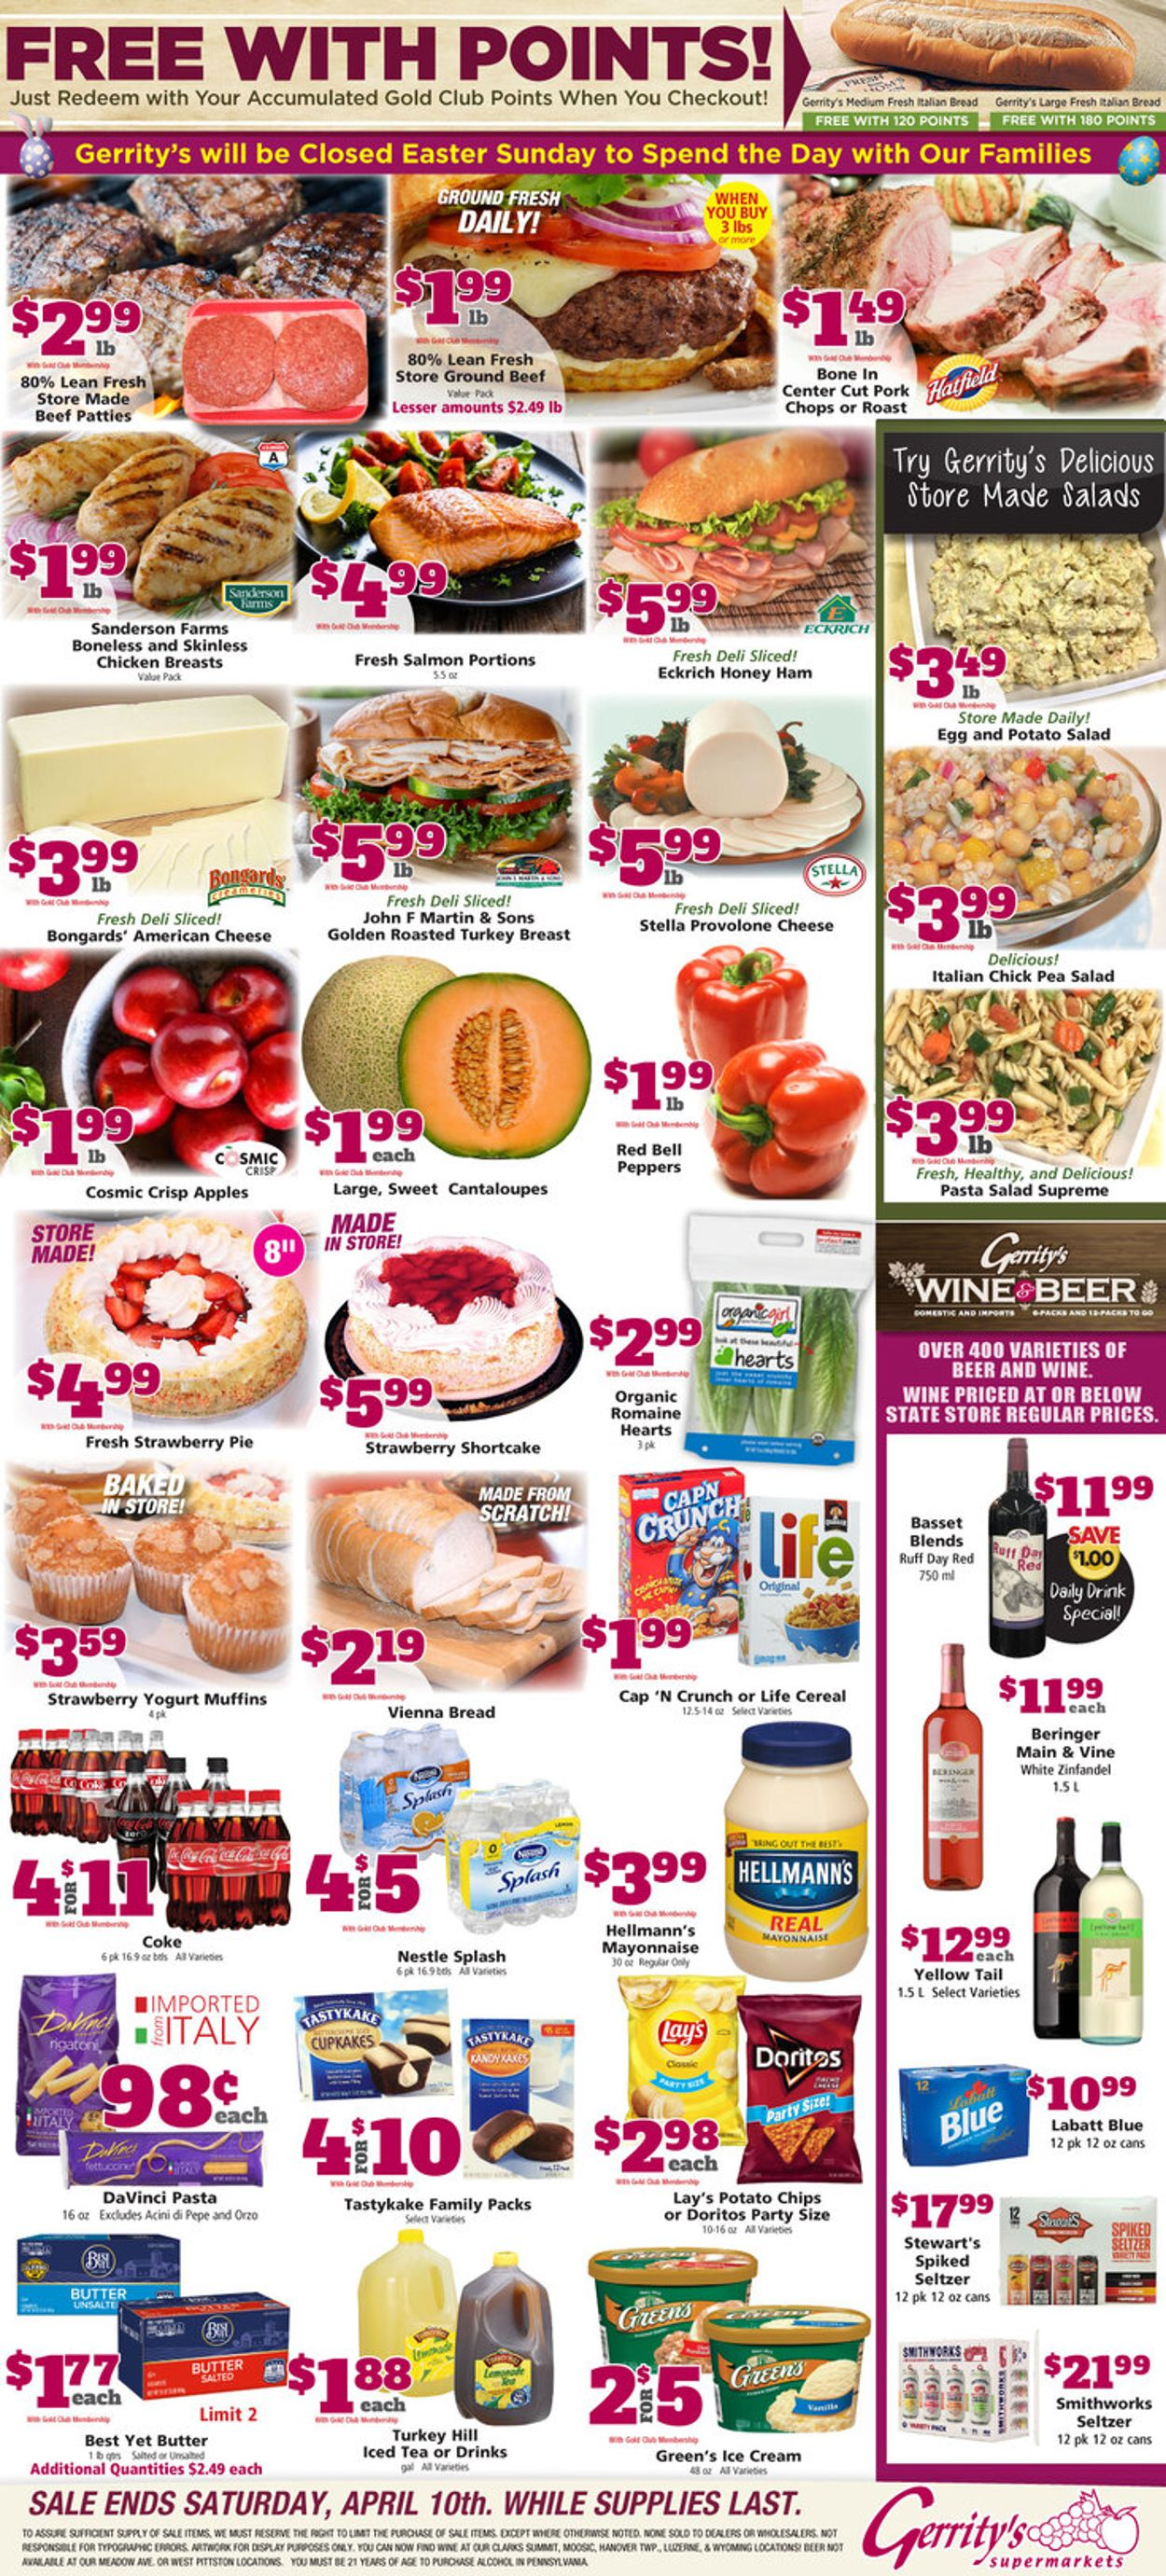 Gerrity's Supermarkets Weekly Ad Circular - valid 04/04-04/10/2021